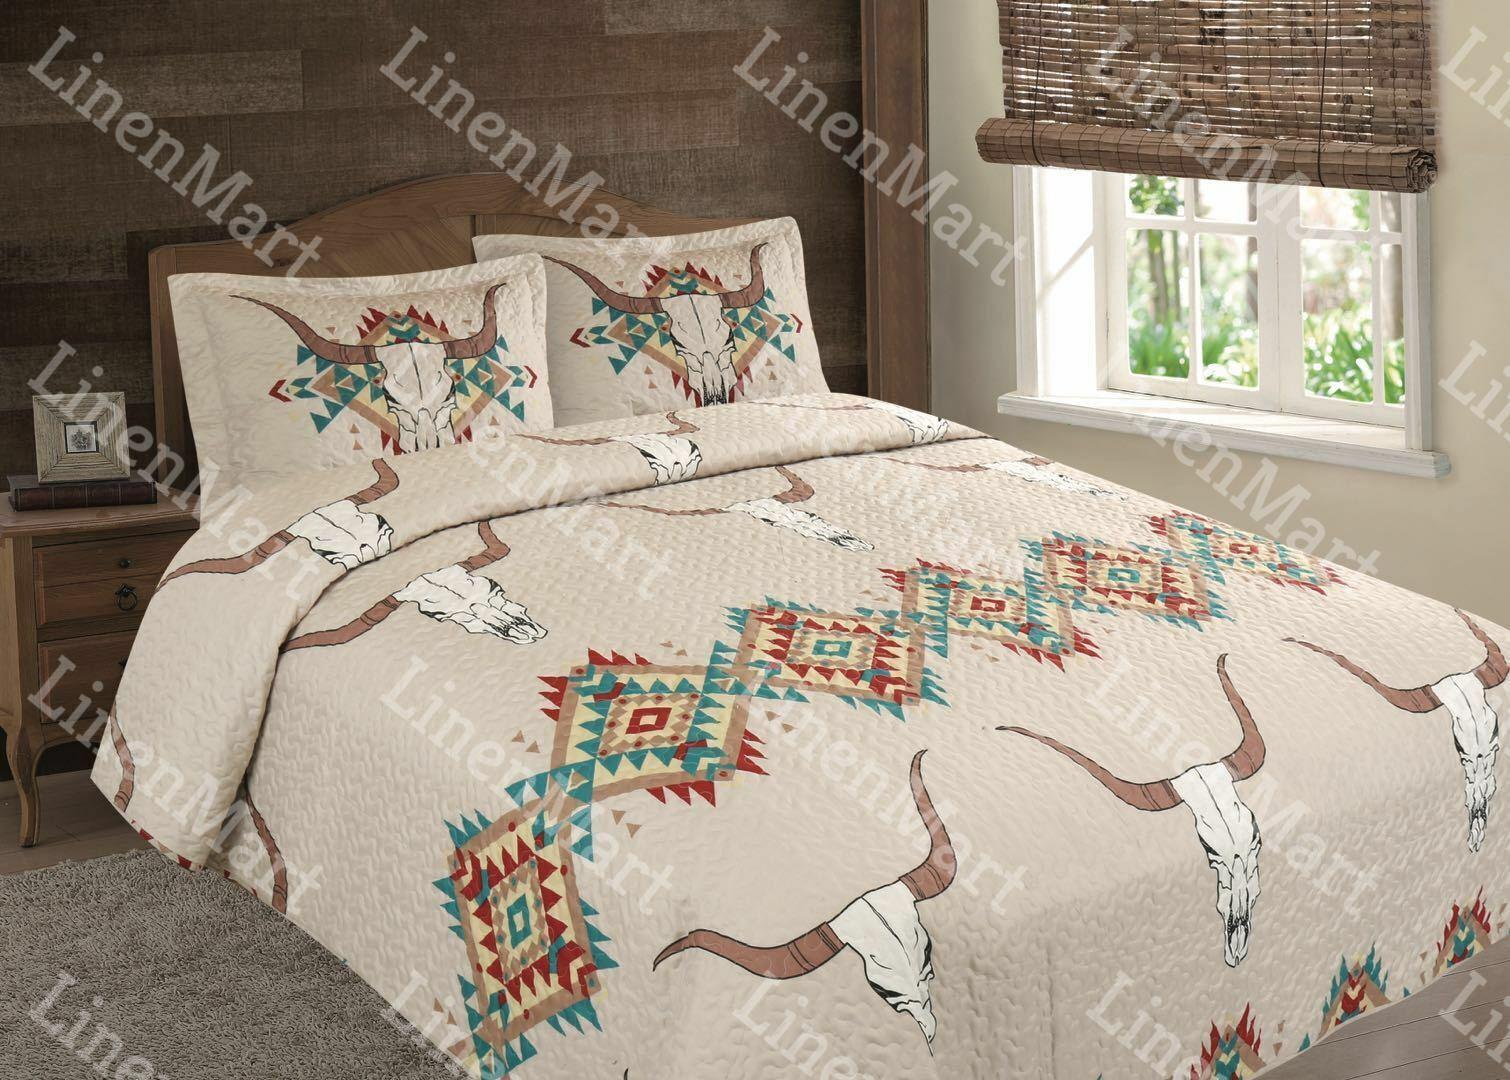 Southwest Aztec Rustic Skull Horn Quilt Coverlet Bedspread - 3 Piece Set